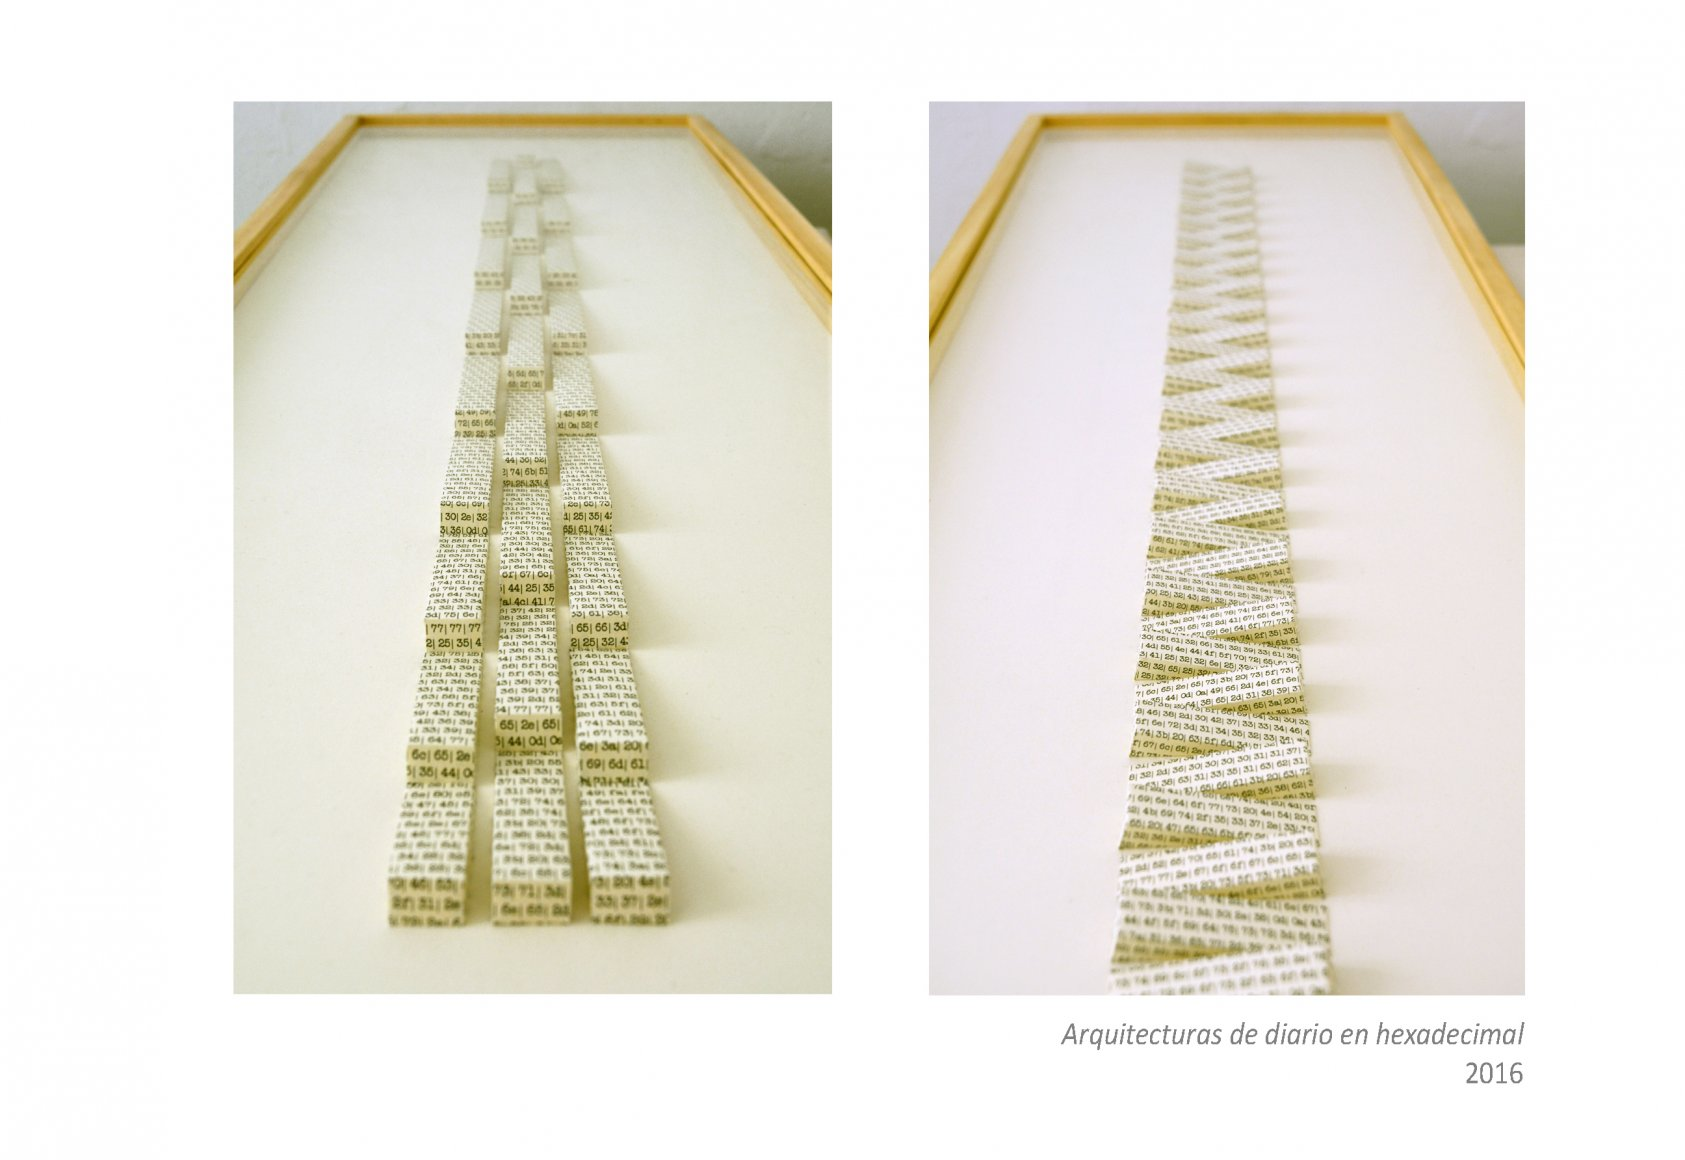 Arquitecturas hexadecimales (2016) - Juan Antonio Cerezuela